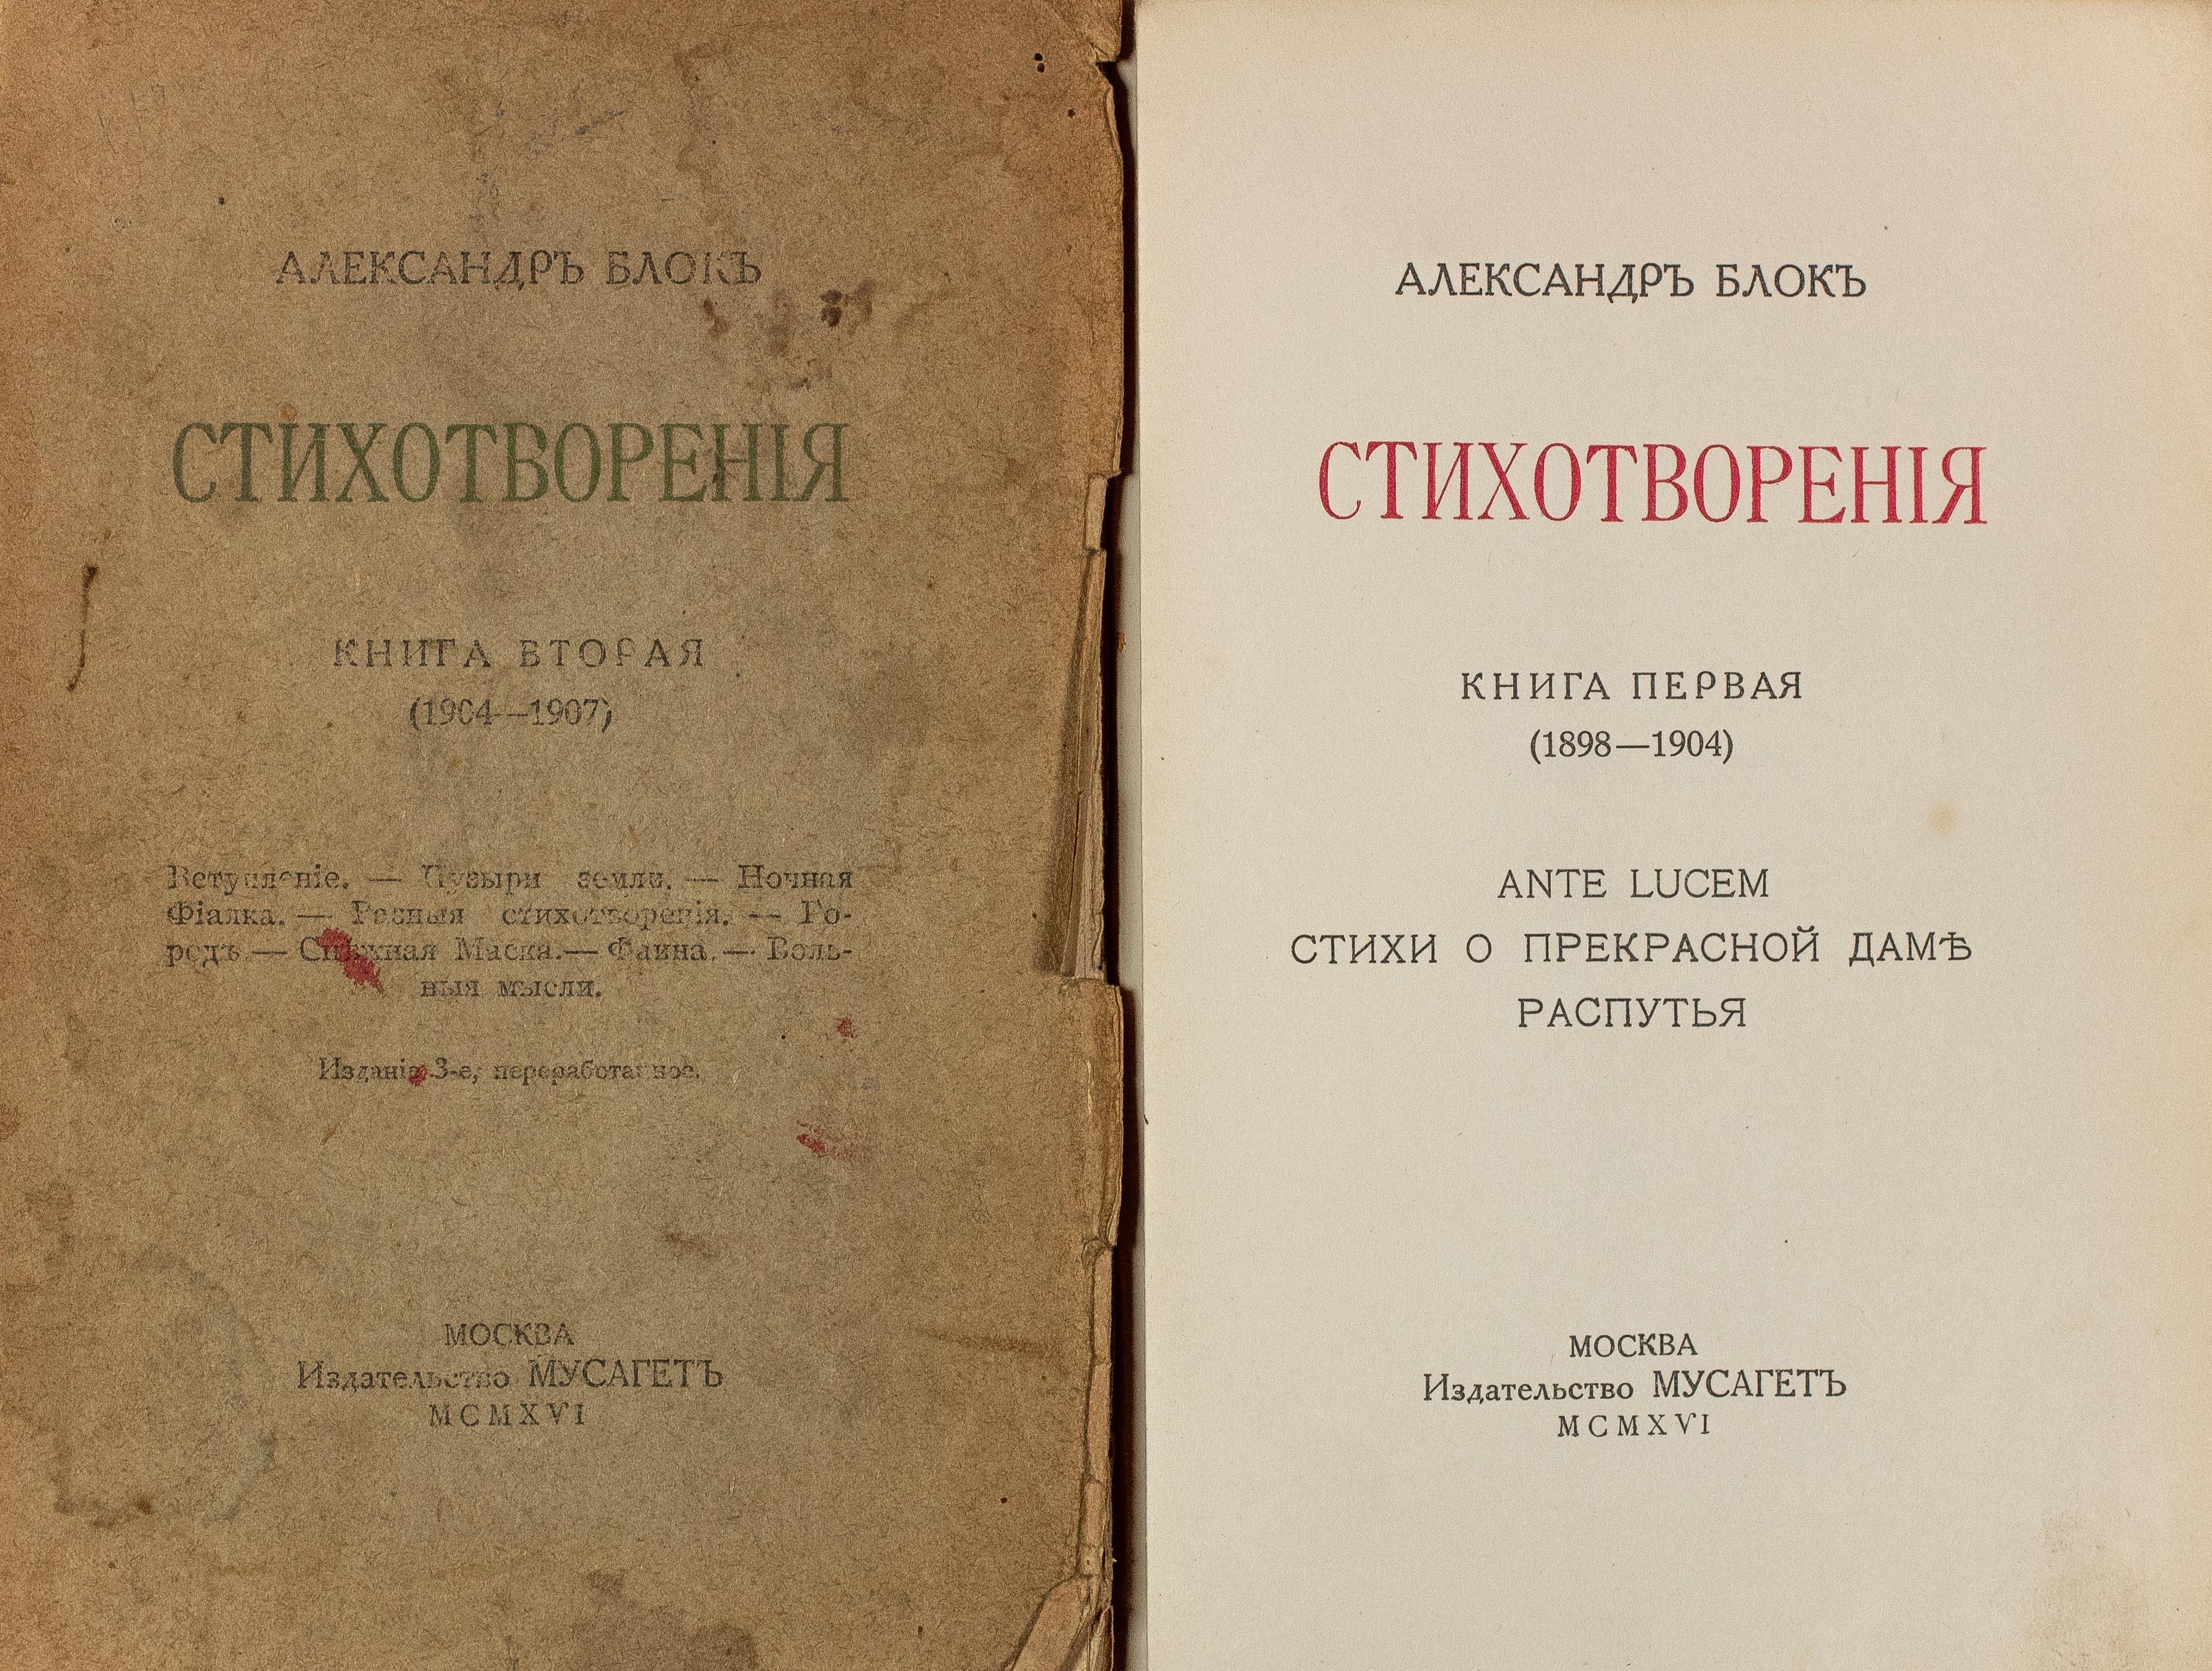 Lot 410 - BLOK, Alexandre. Poèmes. Moscou, 1916. Livres 1 & 2. 2 vol. in-8°, brochés. En [...]